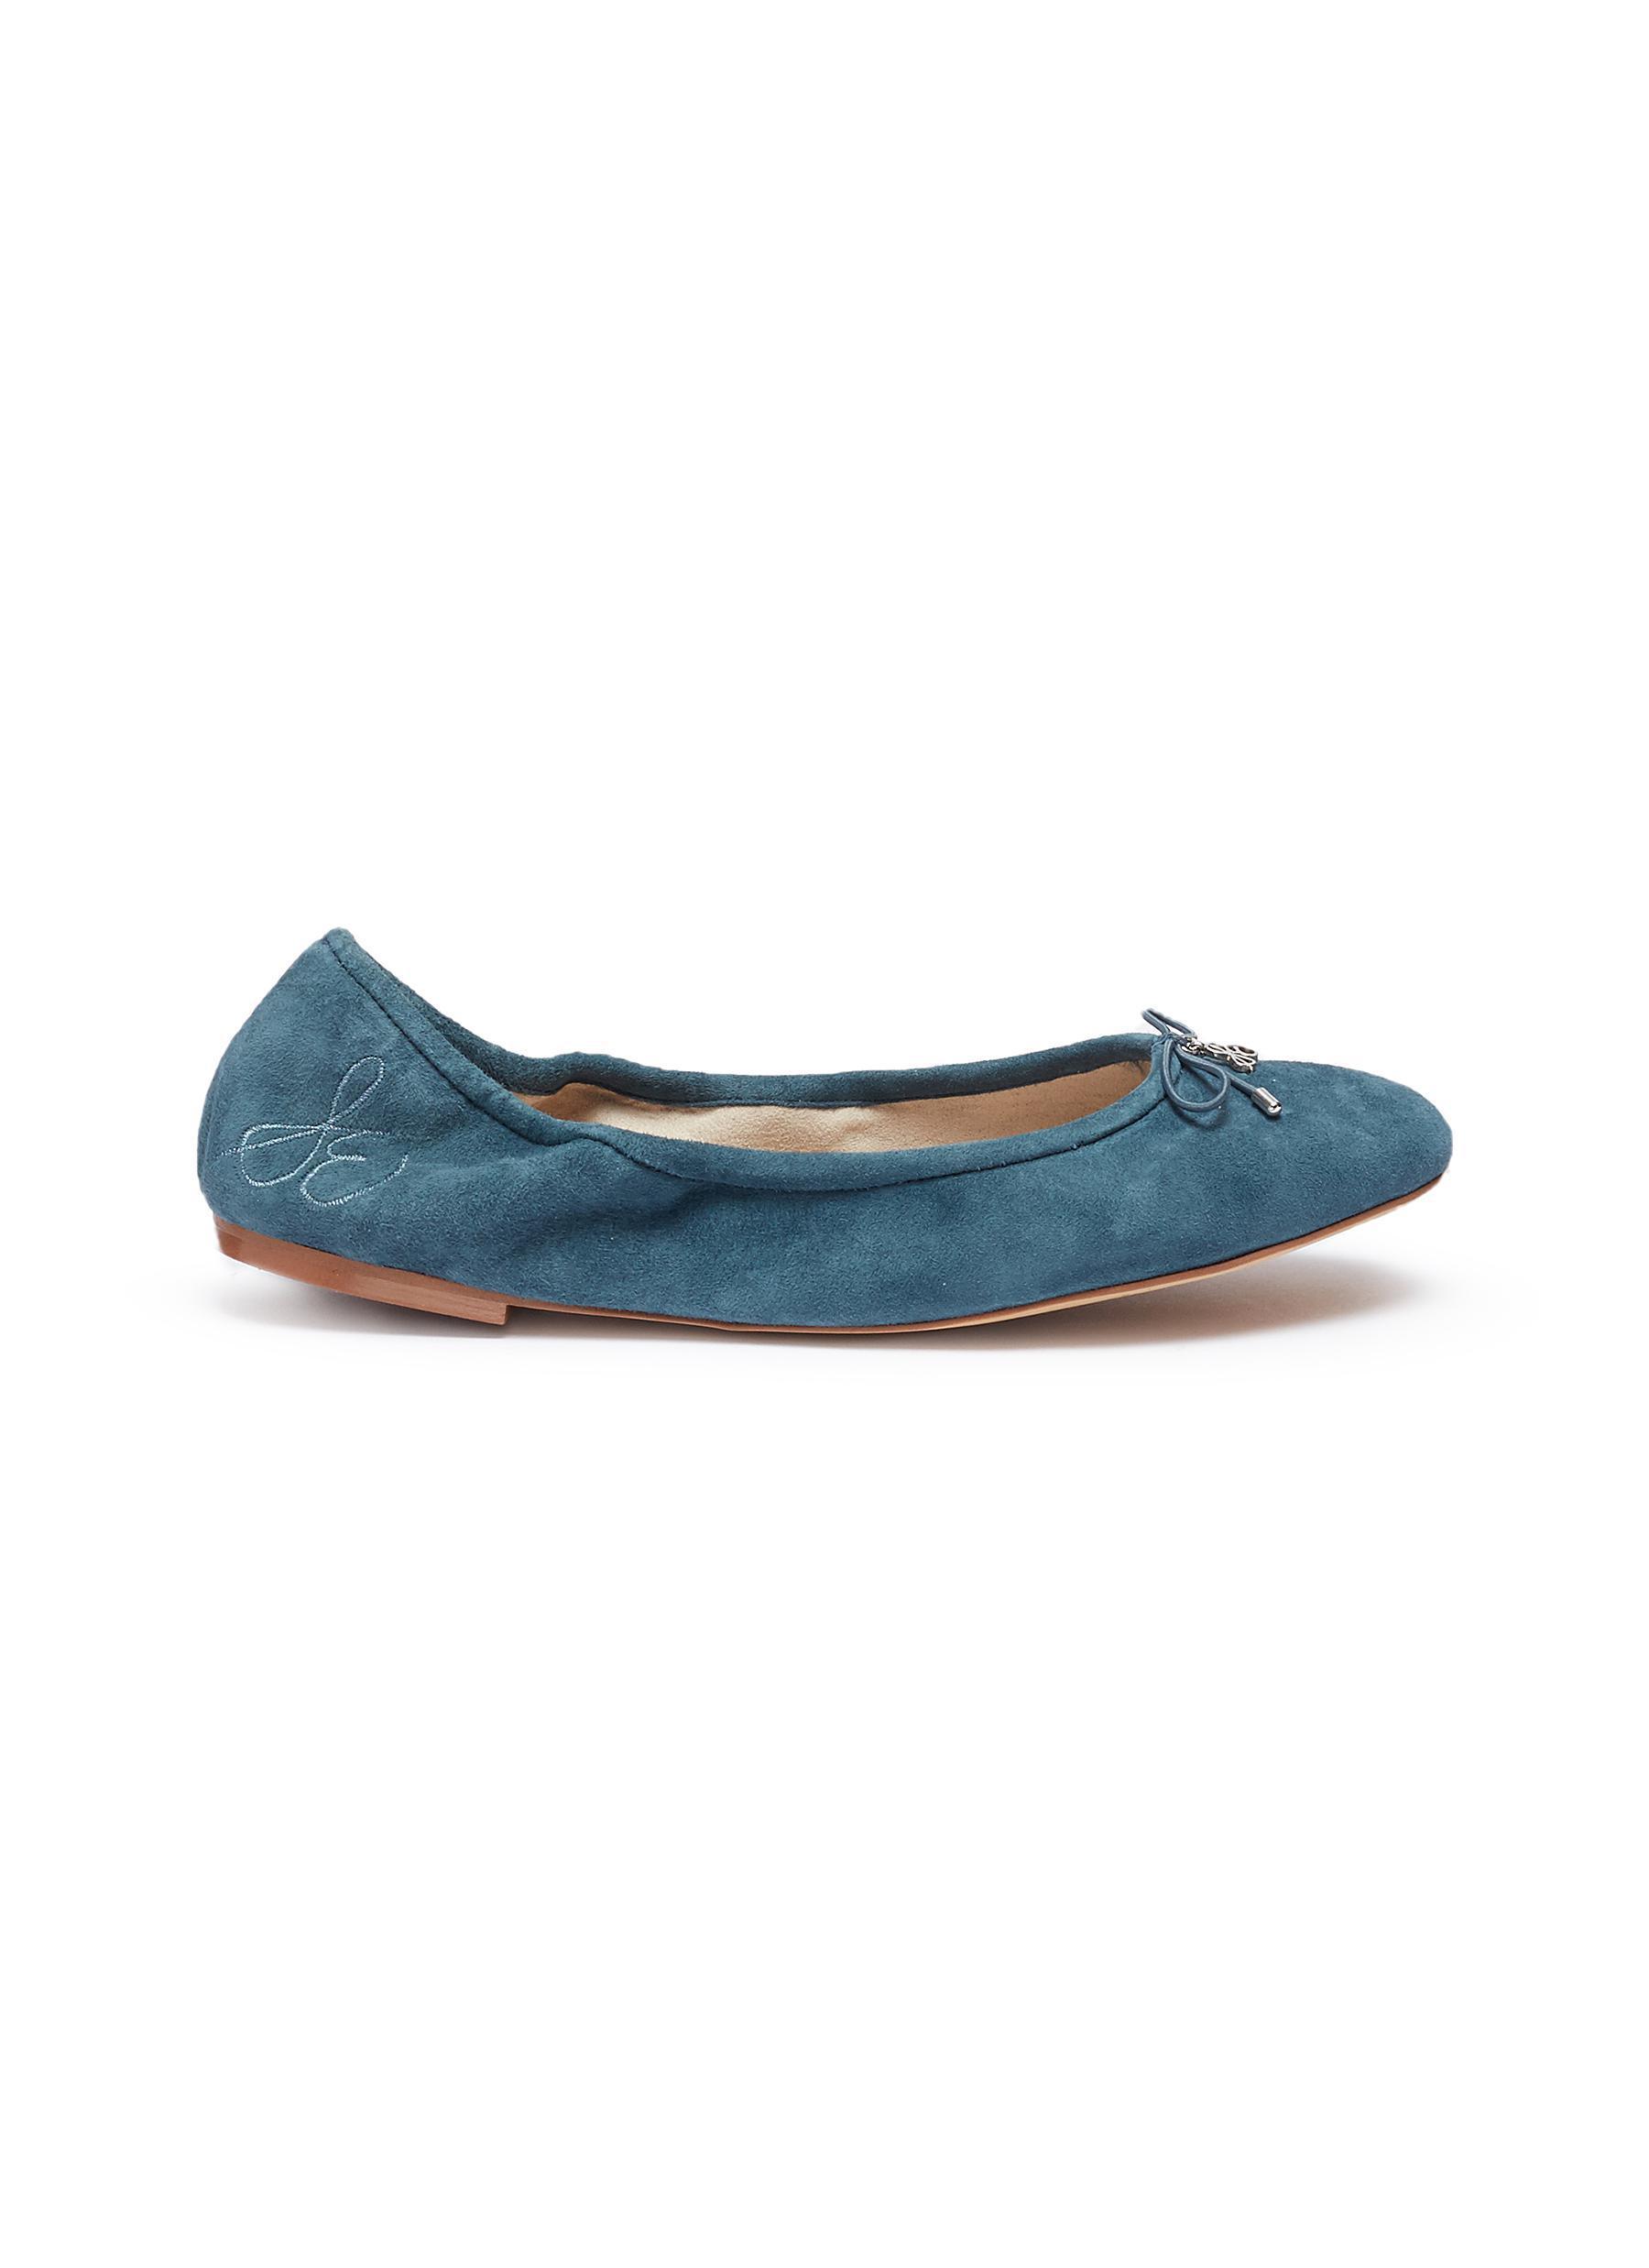 46a2b3f31aa665 Lyst - Sam Edelman  felicia  Suede Ballet Flats in Blue